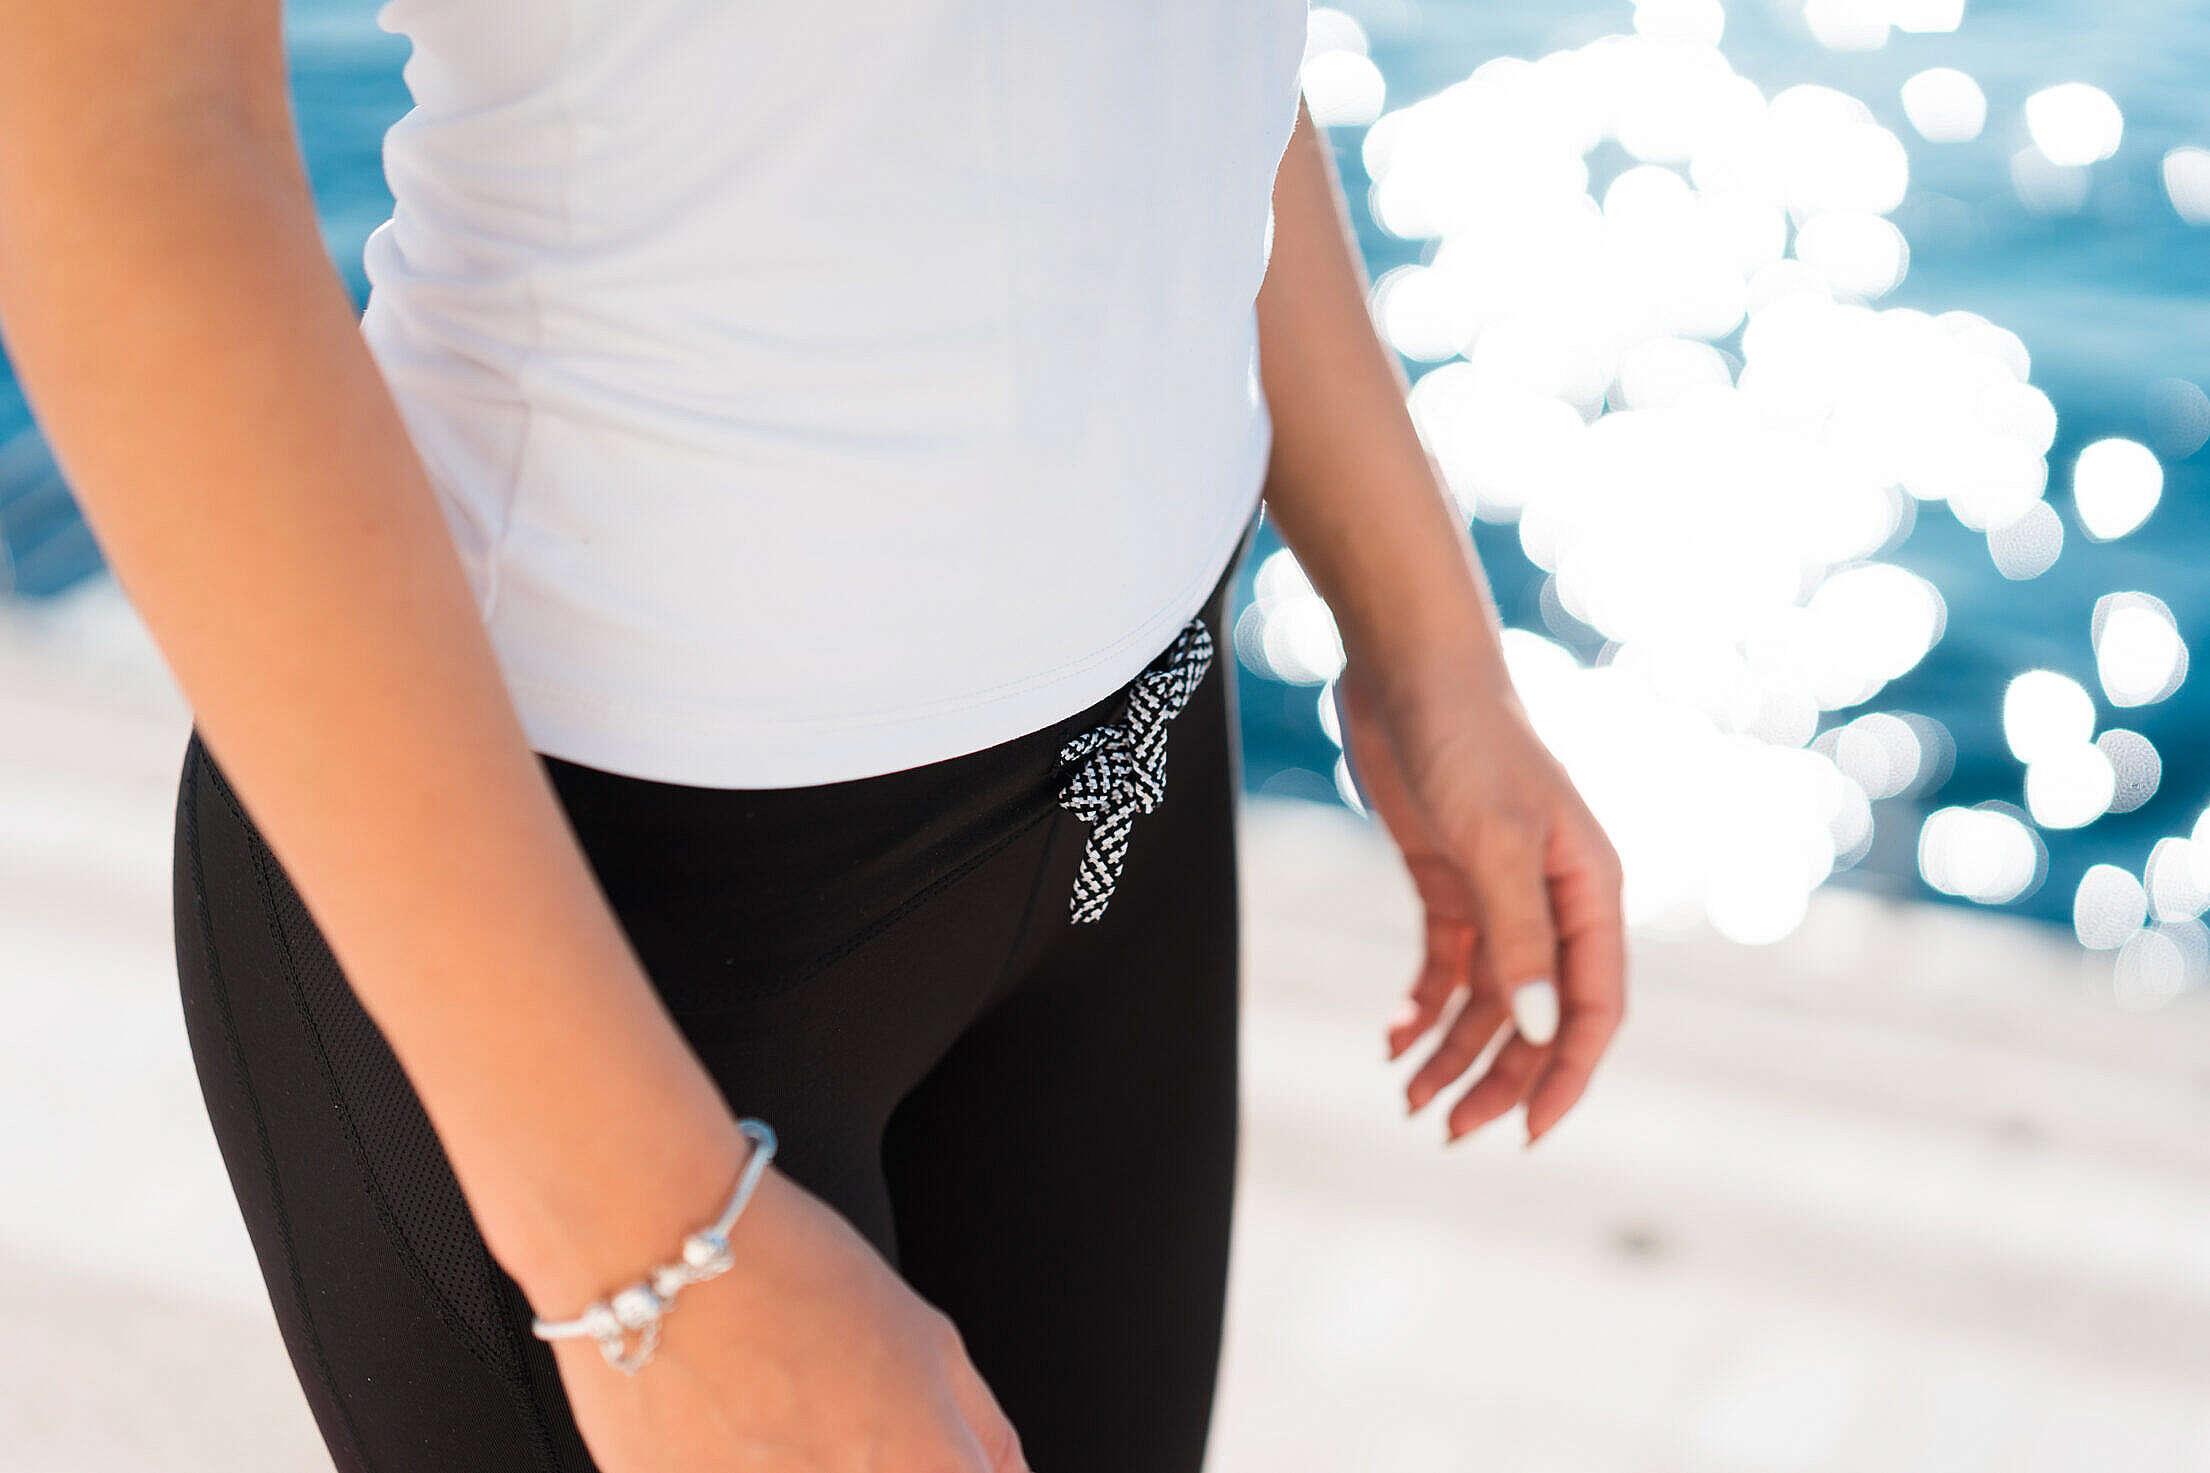 Fitness Woman Leggings Gym Pants Close Up Free Stock Photo